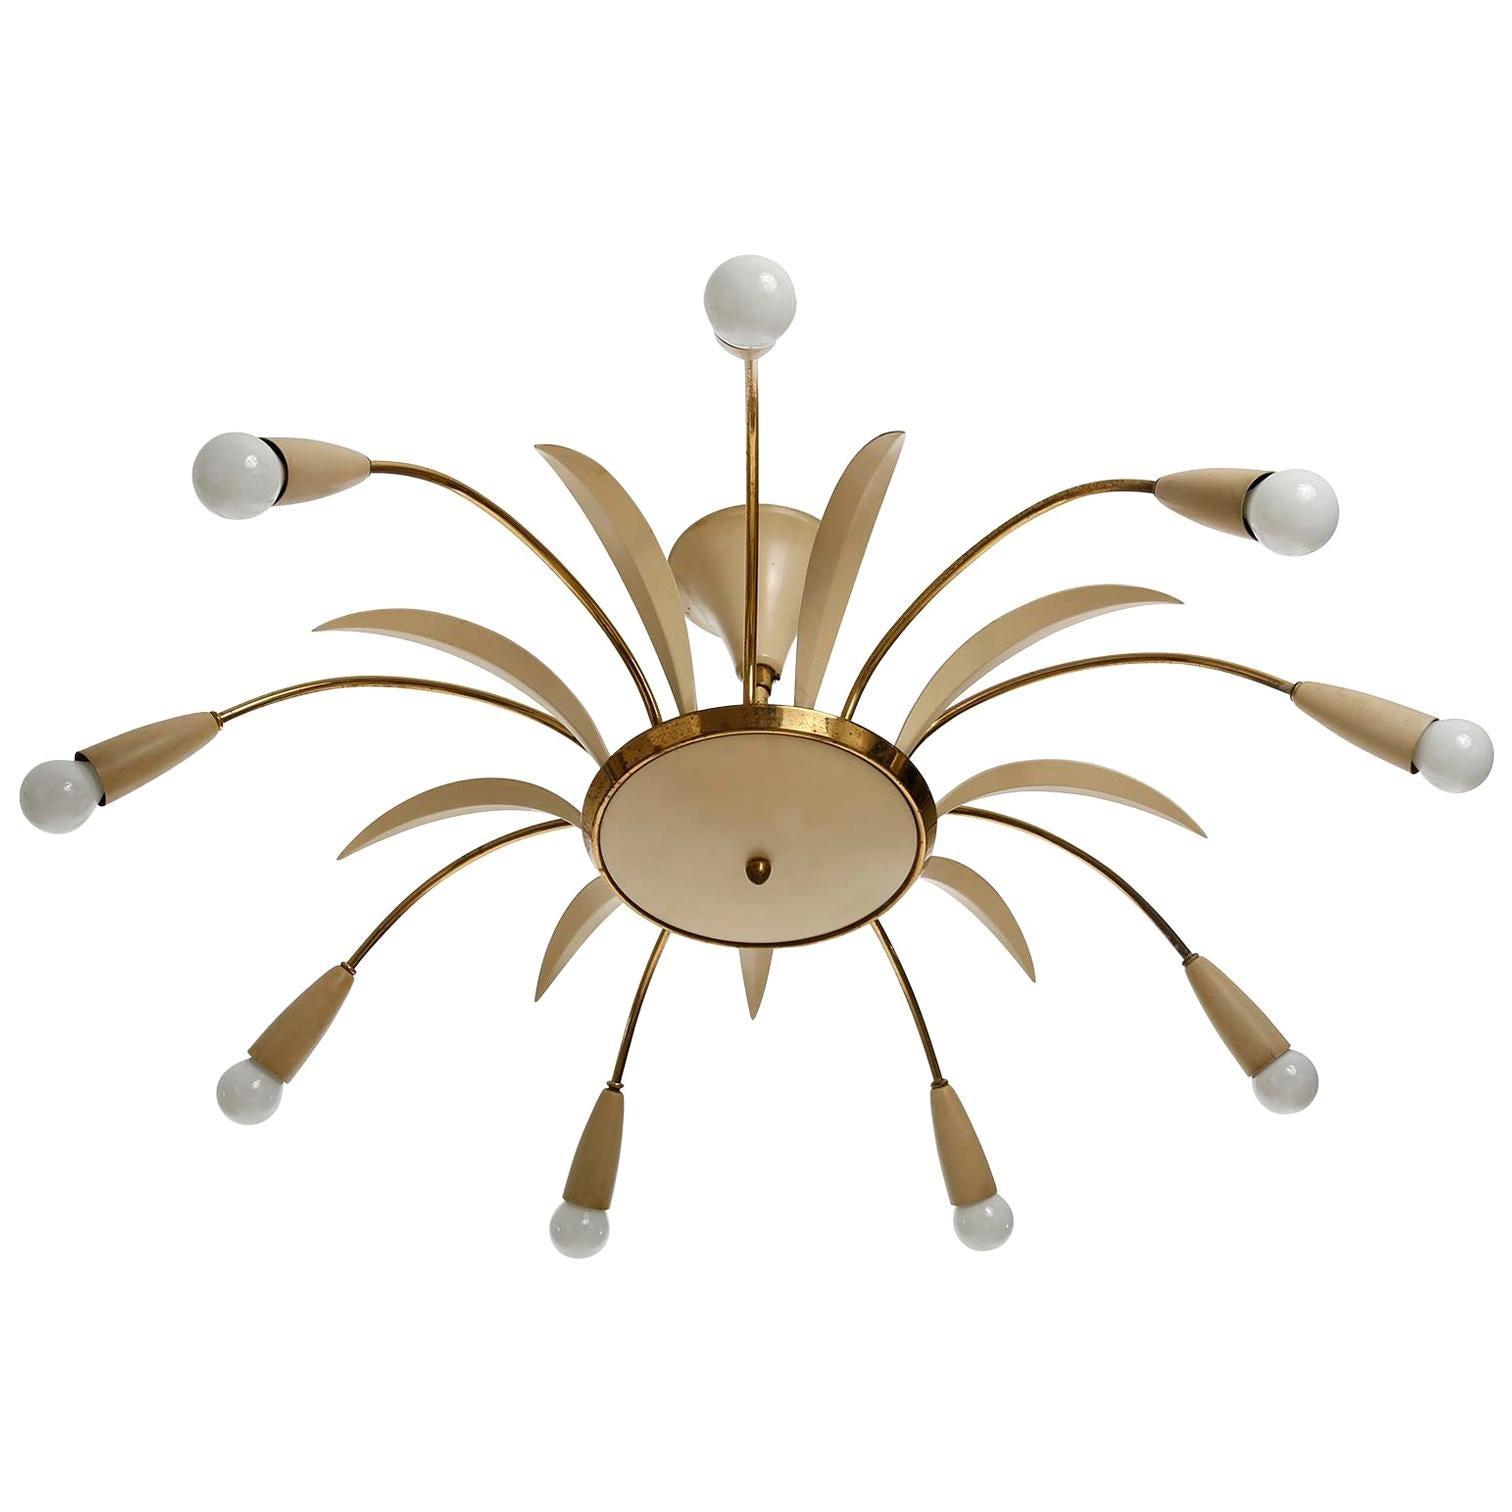 Brass Spider Light Fixture, Italy, 1960